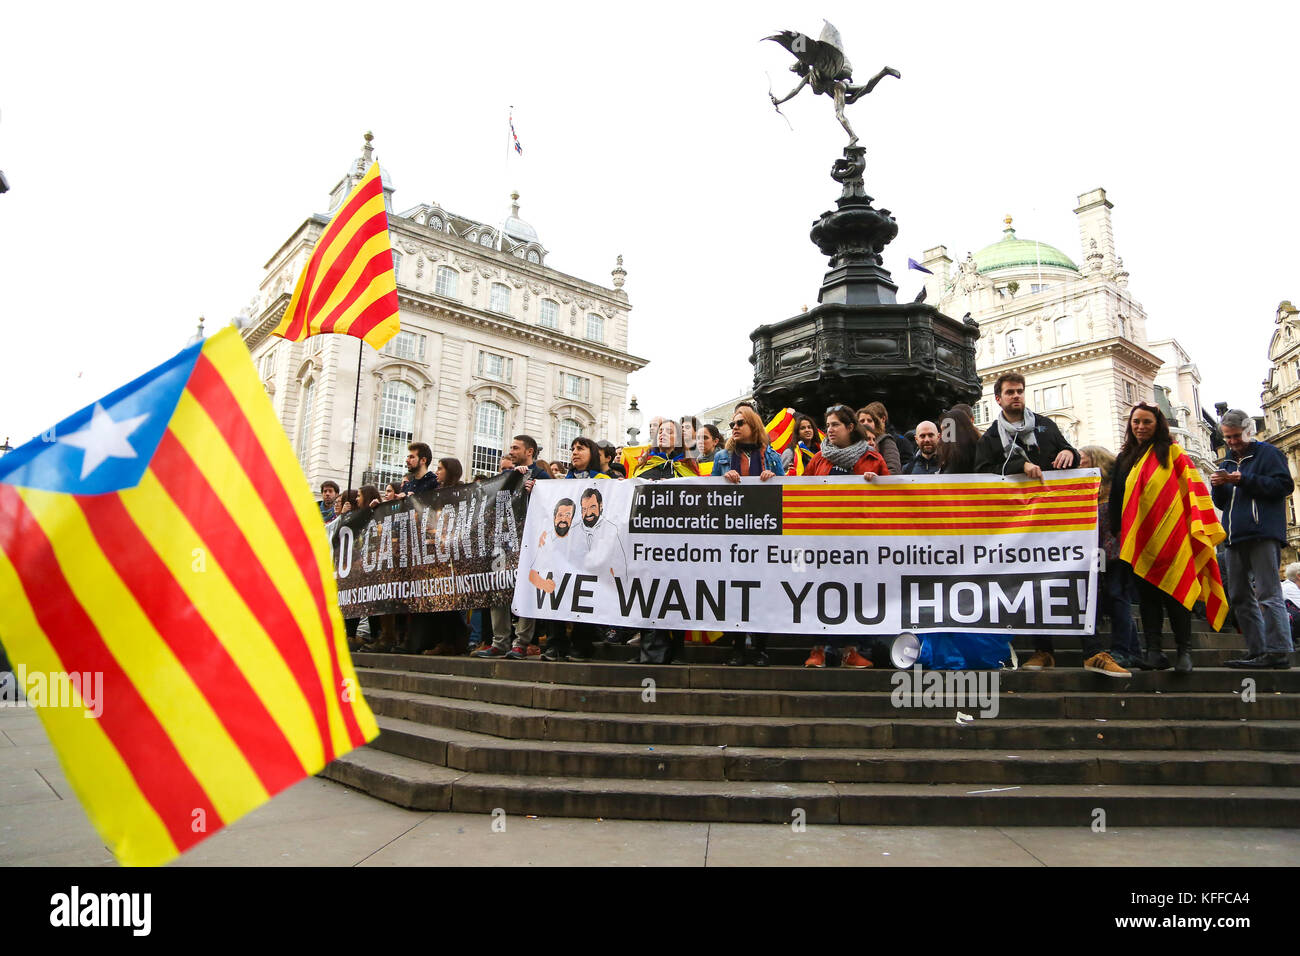 Piccadilly Circus. London. UK 28 Oct 2017 - Demonstrators protest in London's Piccadilly Circus against Spanish - Stock Image